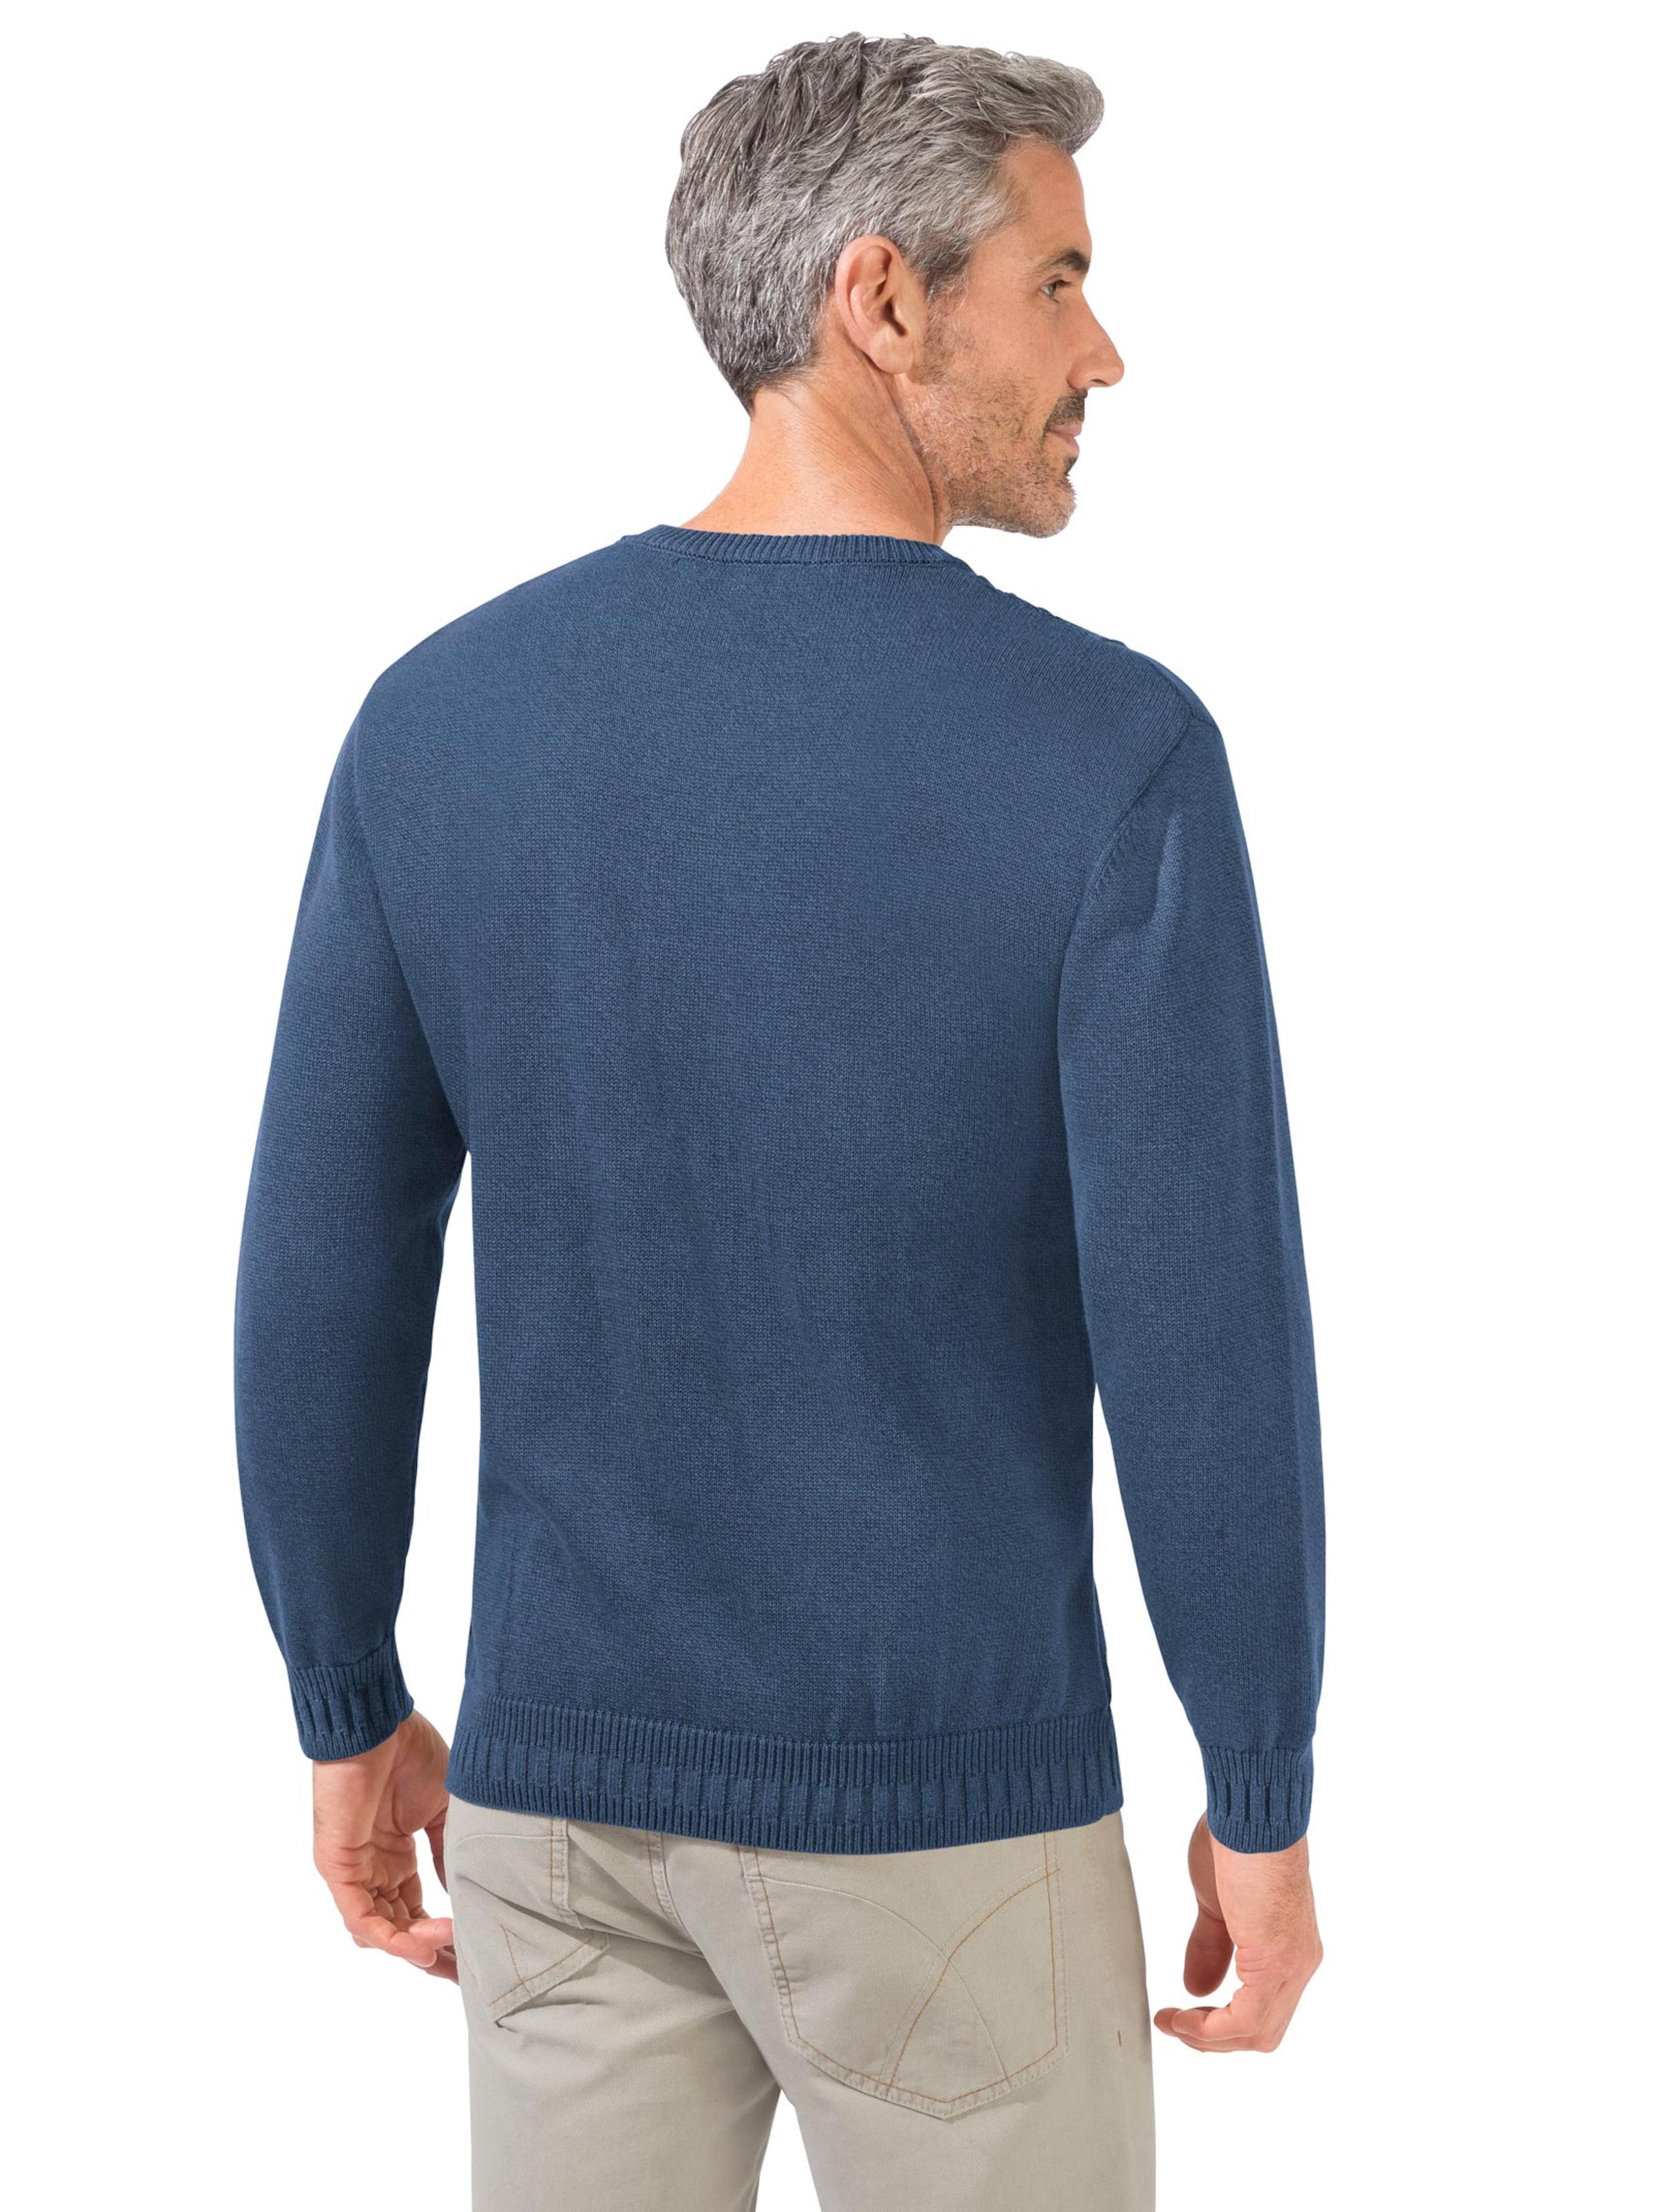 witt weiden - Herren Pullover blau-meliert